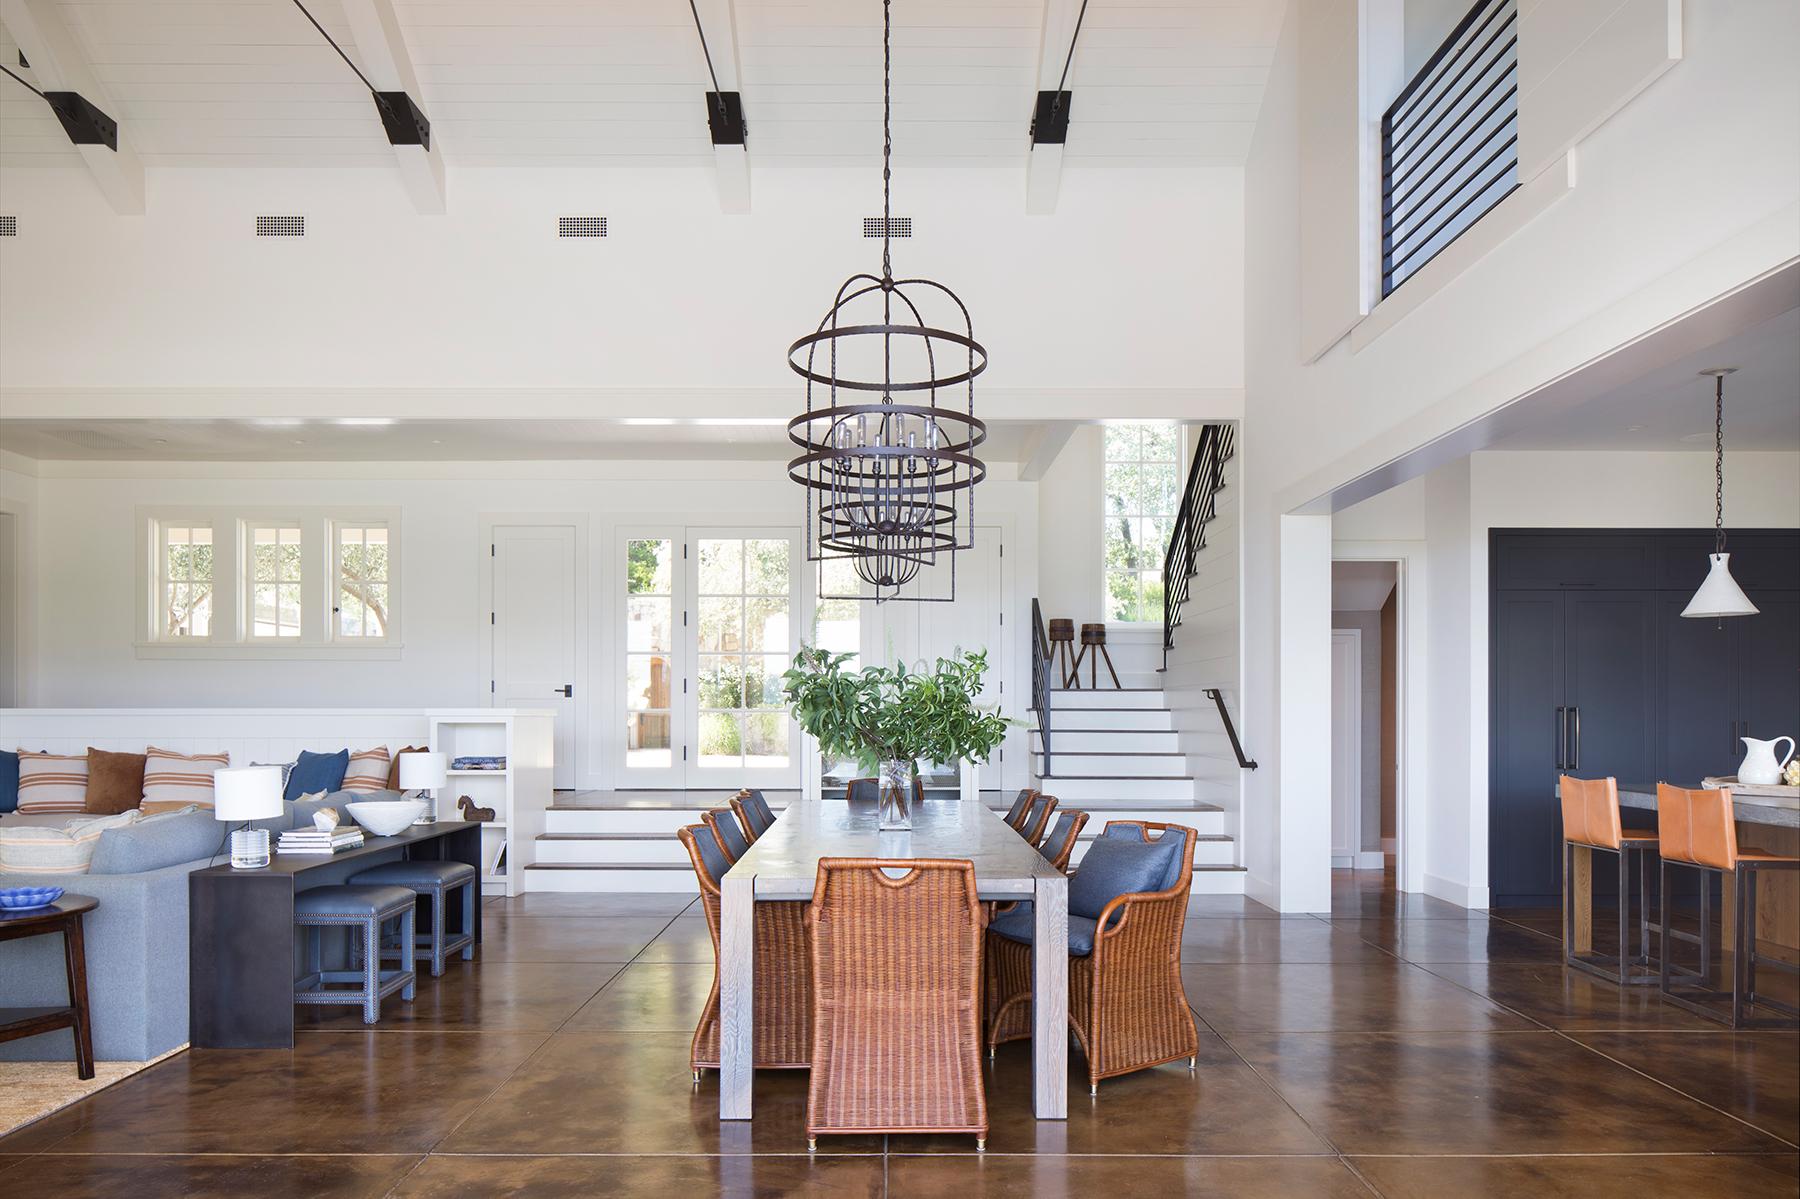 Jennifer_robins_interiors_projects_st_helena_III_2_dining_room_DR_kitchen_living_room_LR